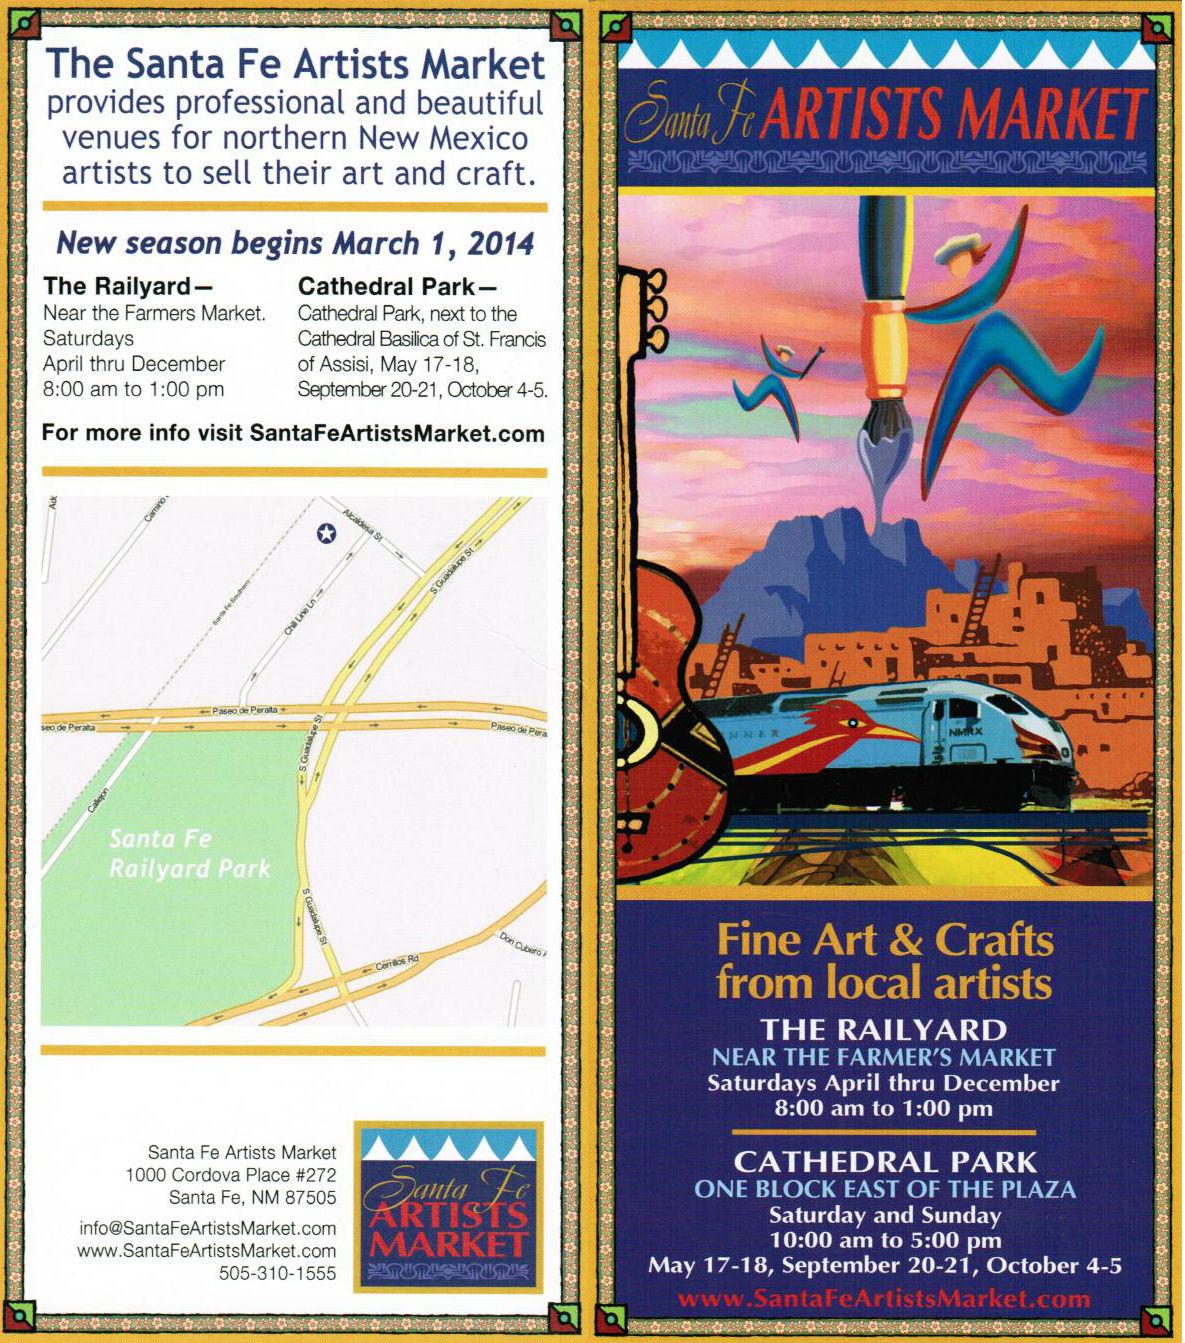 Santa Fe Artists Market brochure